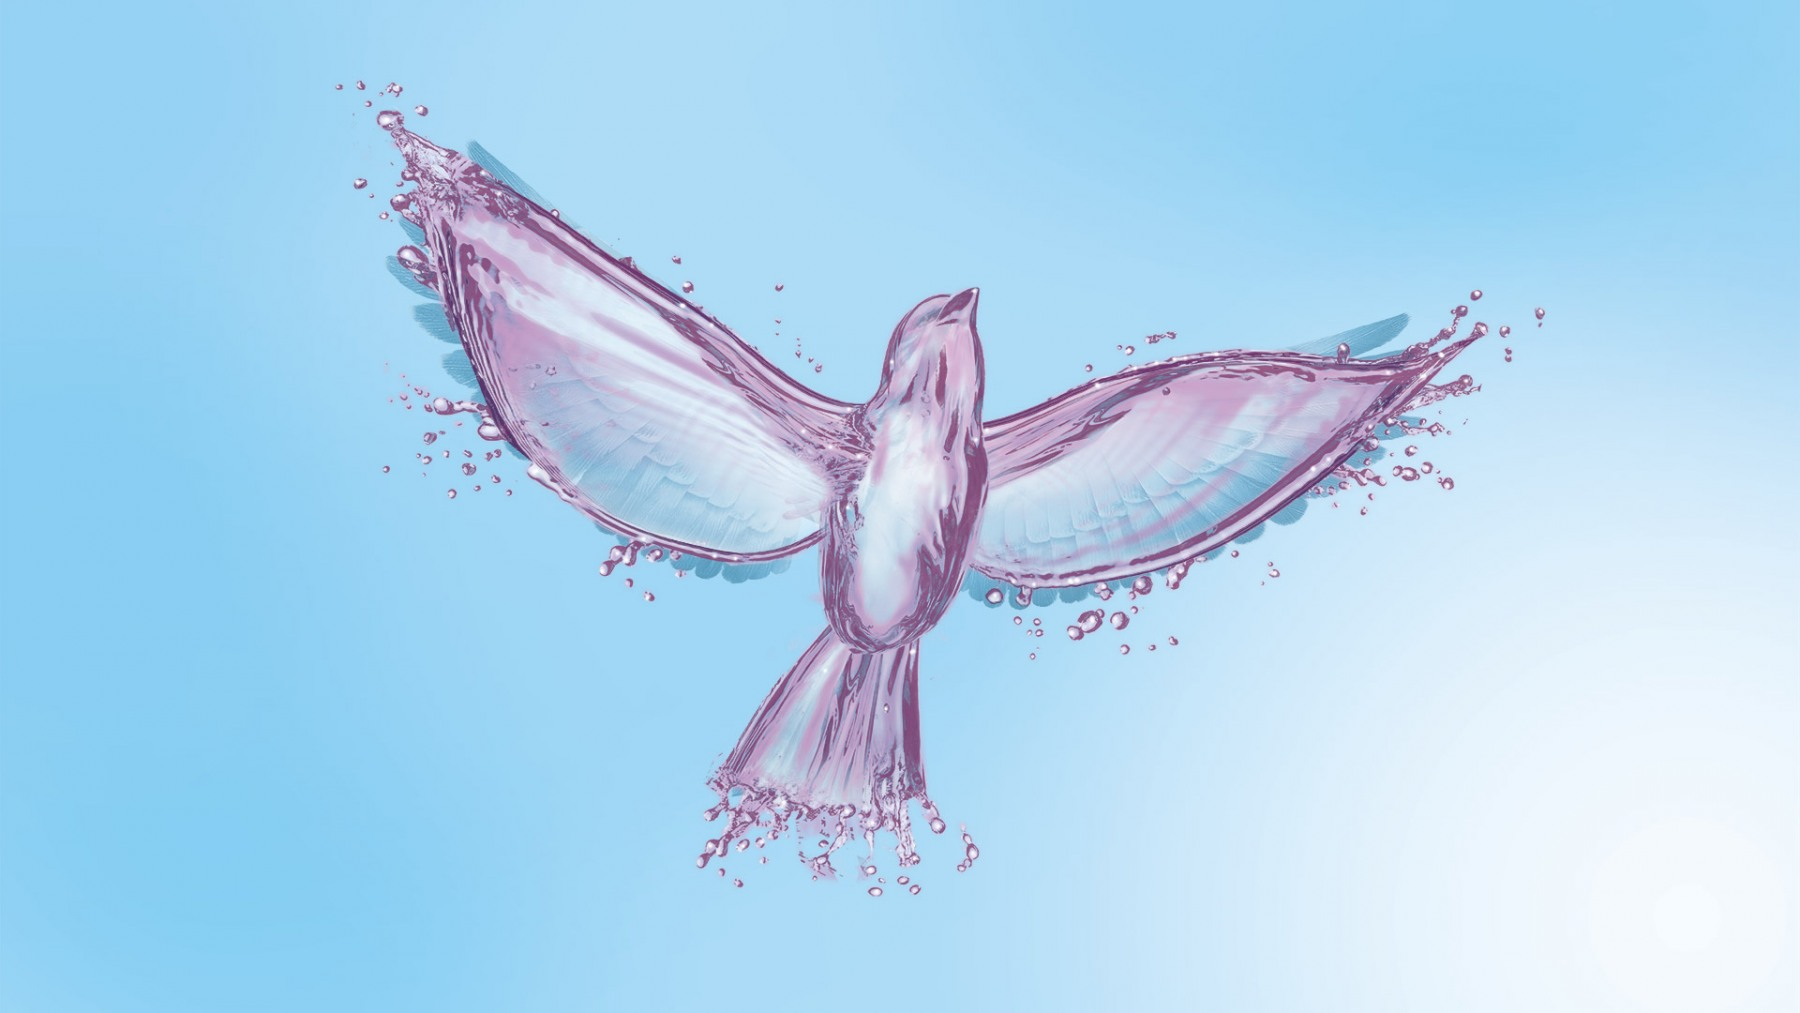 Uplifting Free Bird